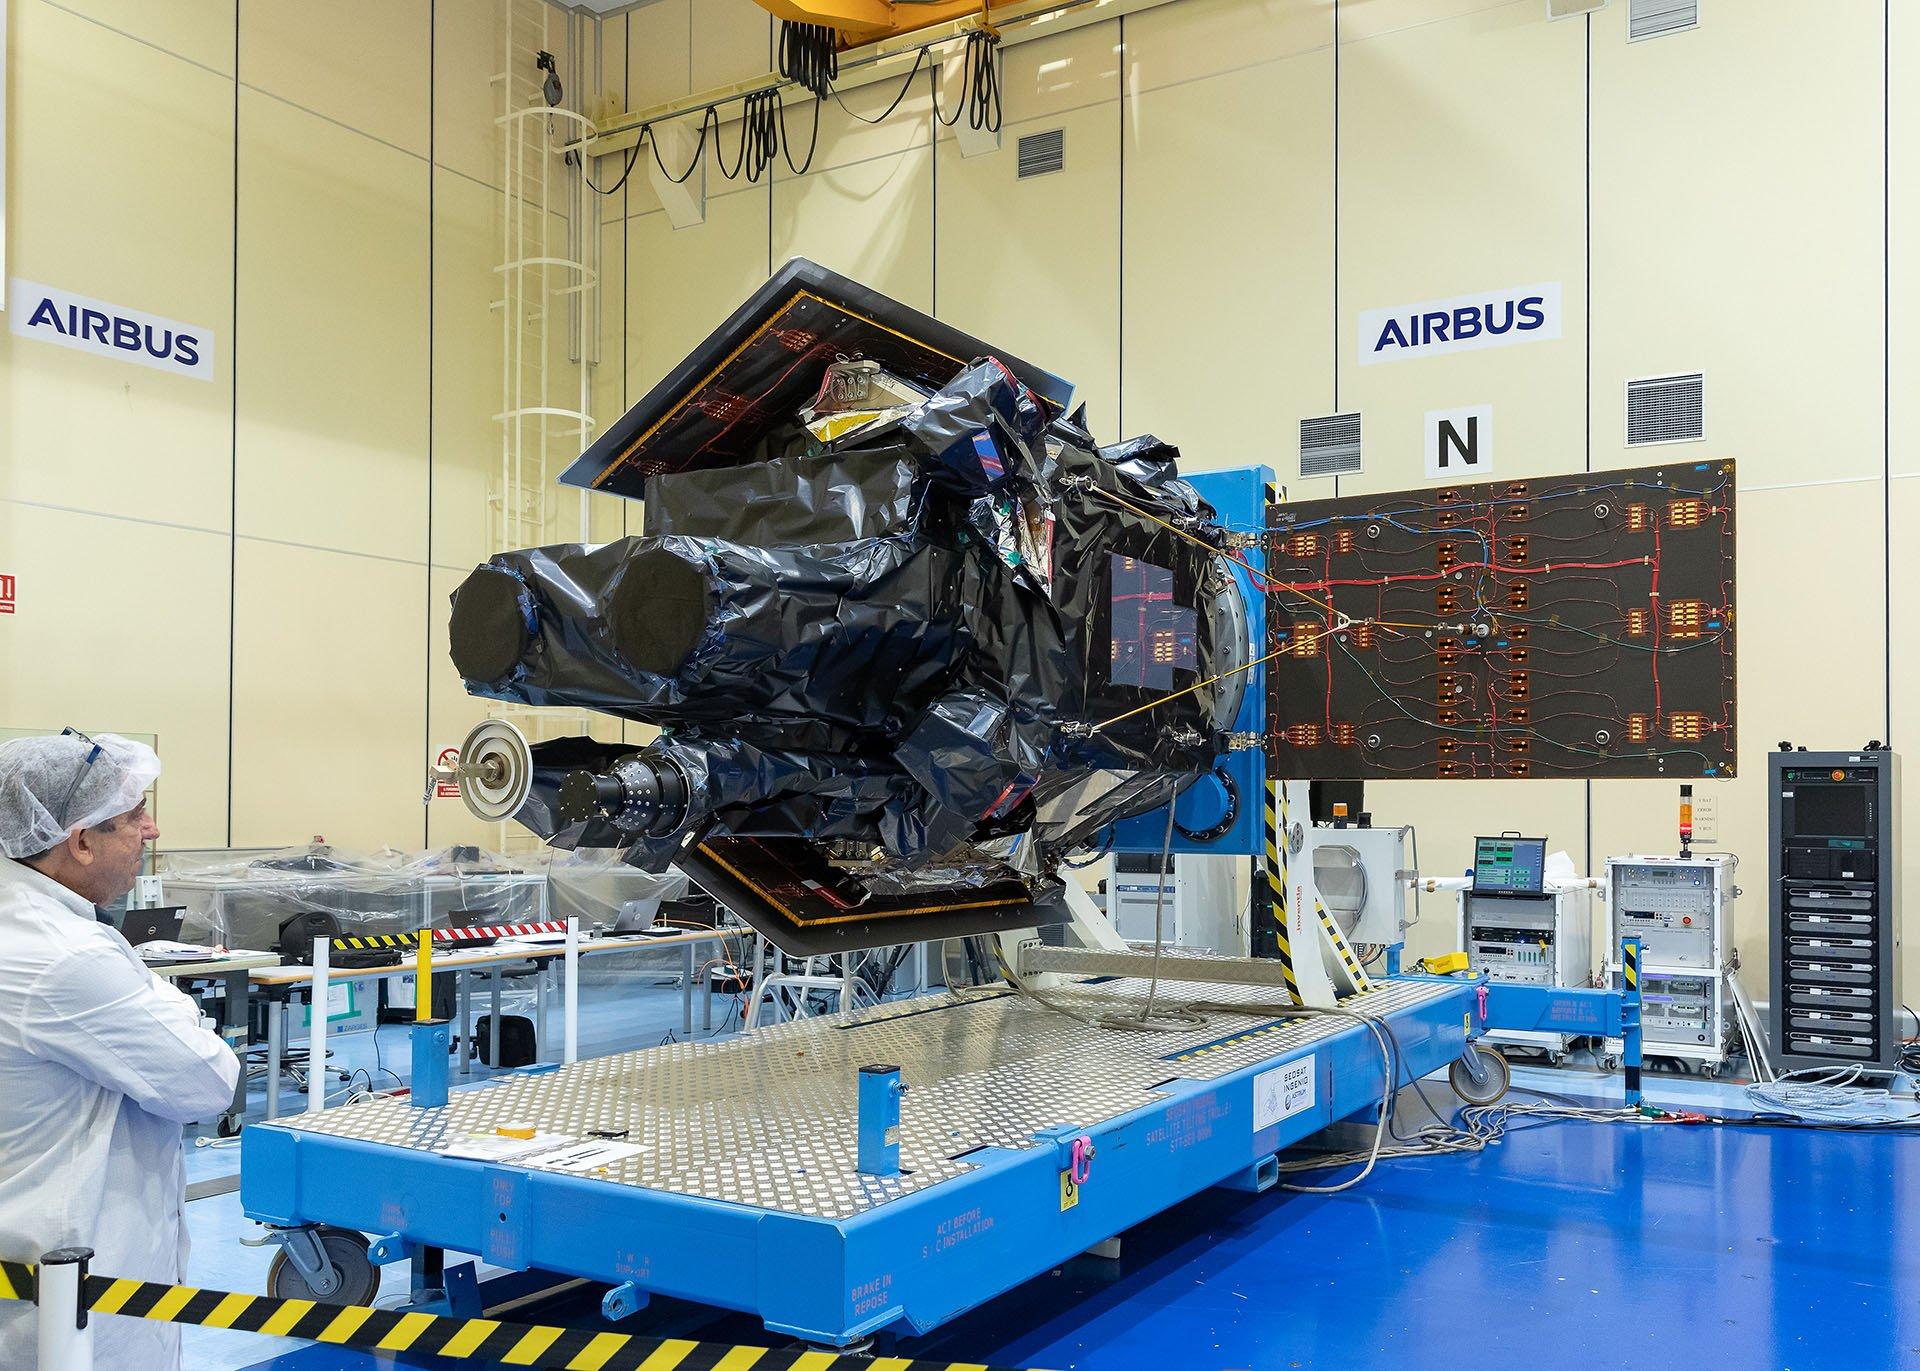 Vega VV17 (SEOSat-Ingenio & Taranis) - CSG - 24.08.2020 ? 1_jfif89